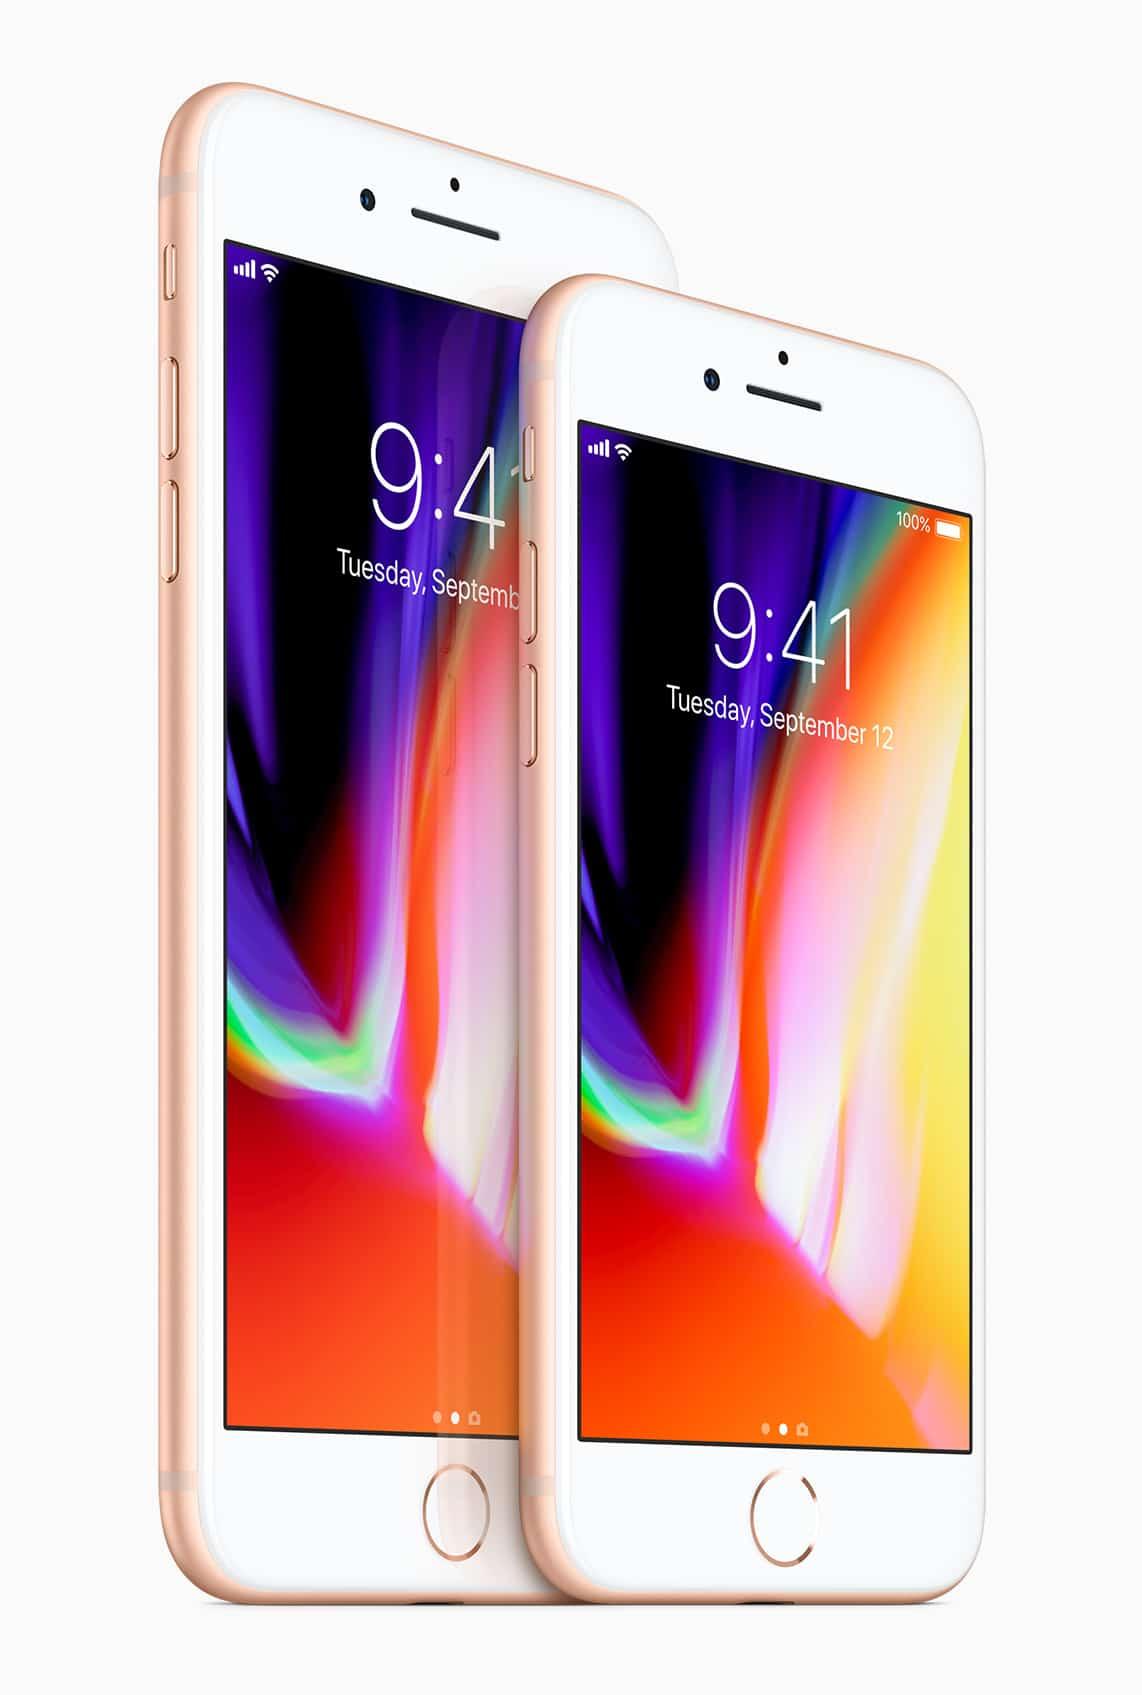 iphone-8-iphone-8-plus-on-120917